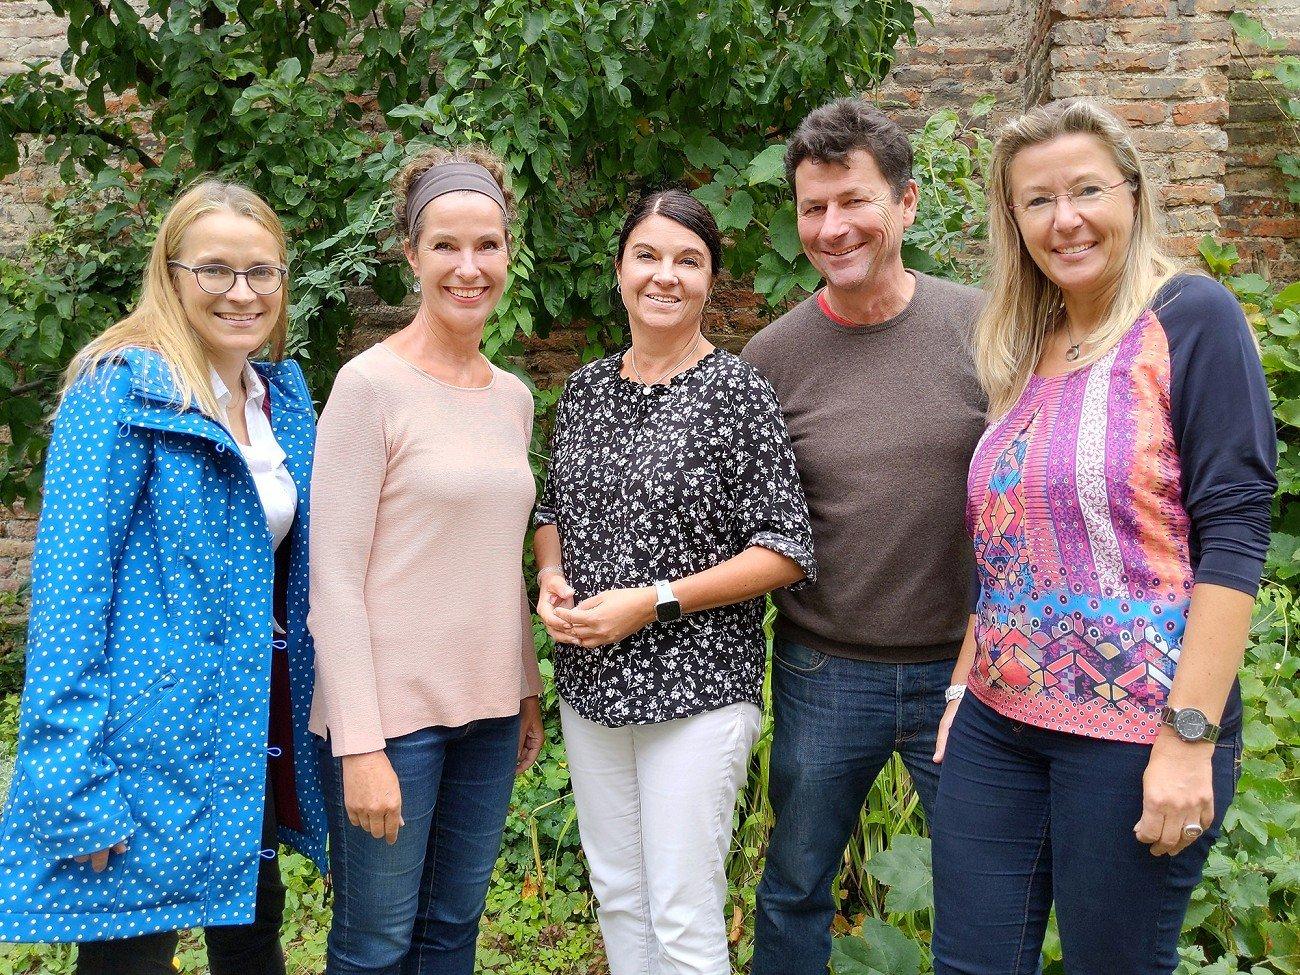 v.l.: Angela Sümnik (Schriftführerin), Ursula Felsenstein (2. Vorsitzende), Petra Tonsky-Katzer (1. Vorsitzende), Thomas Körner-Wilsdorf (3. Vorsitzender), Claudia Atzkern (Kassenführerin)